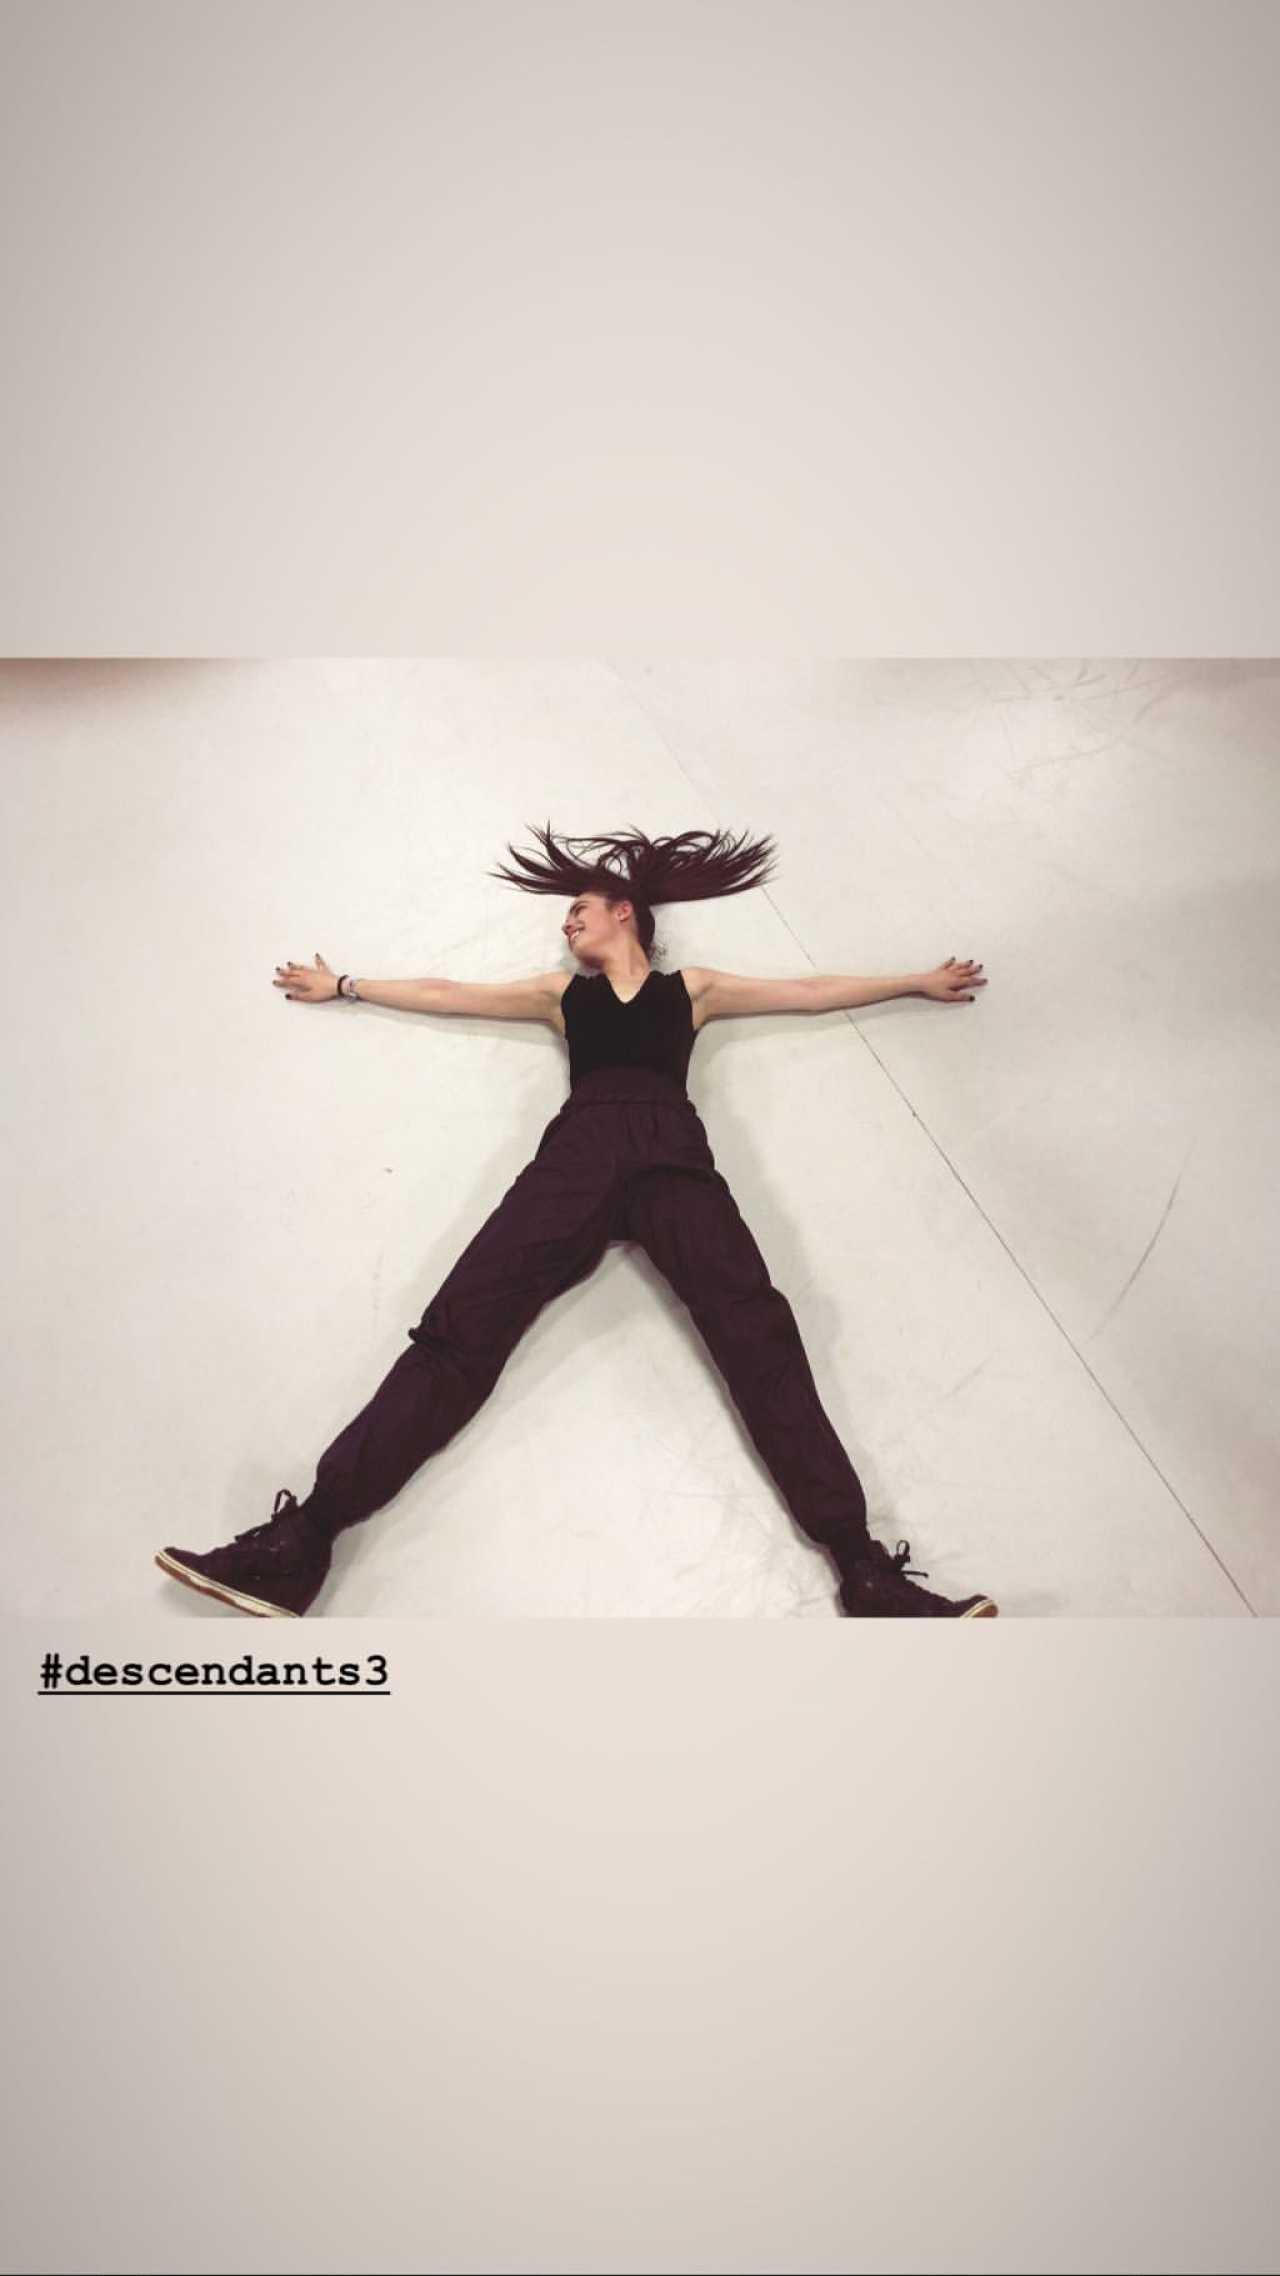 Sofia Carson 2020 : Sofia Carson – Instagram and social media pics-16